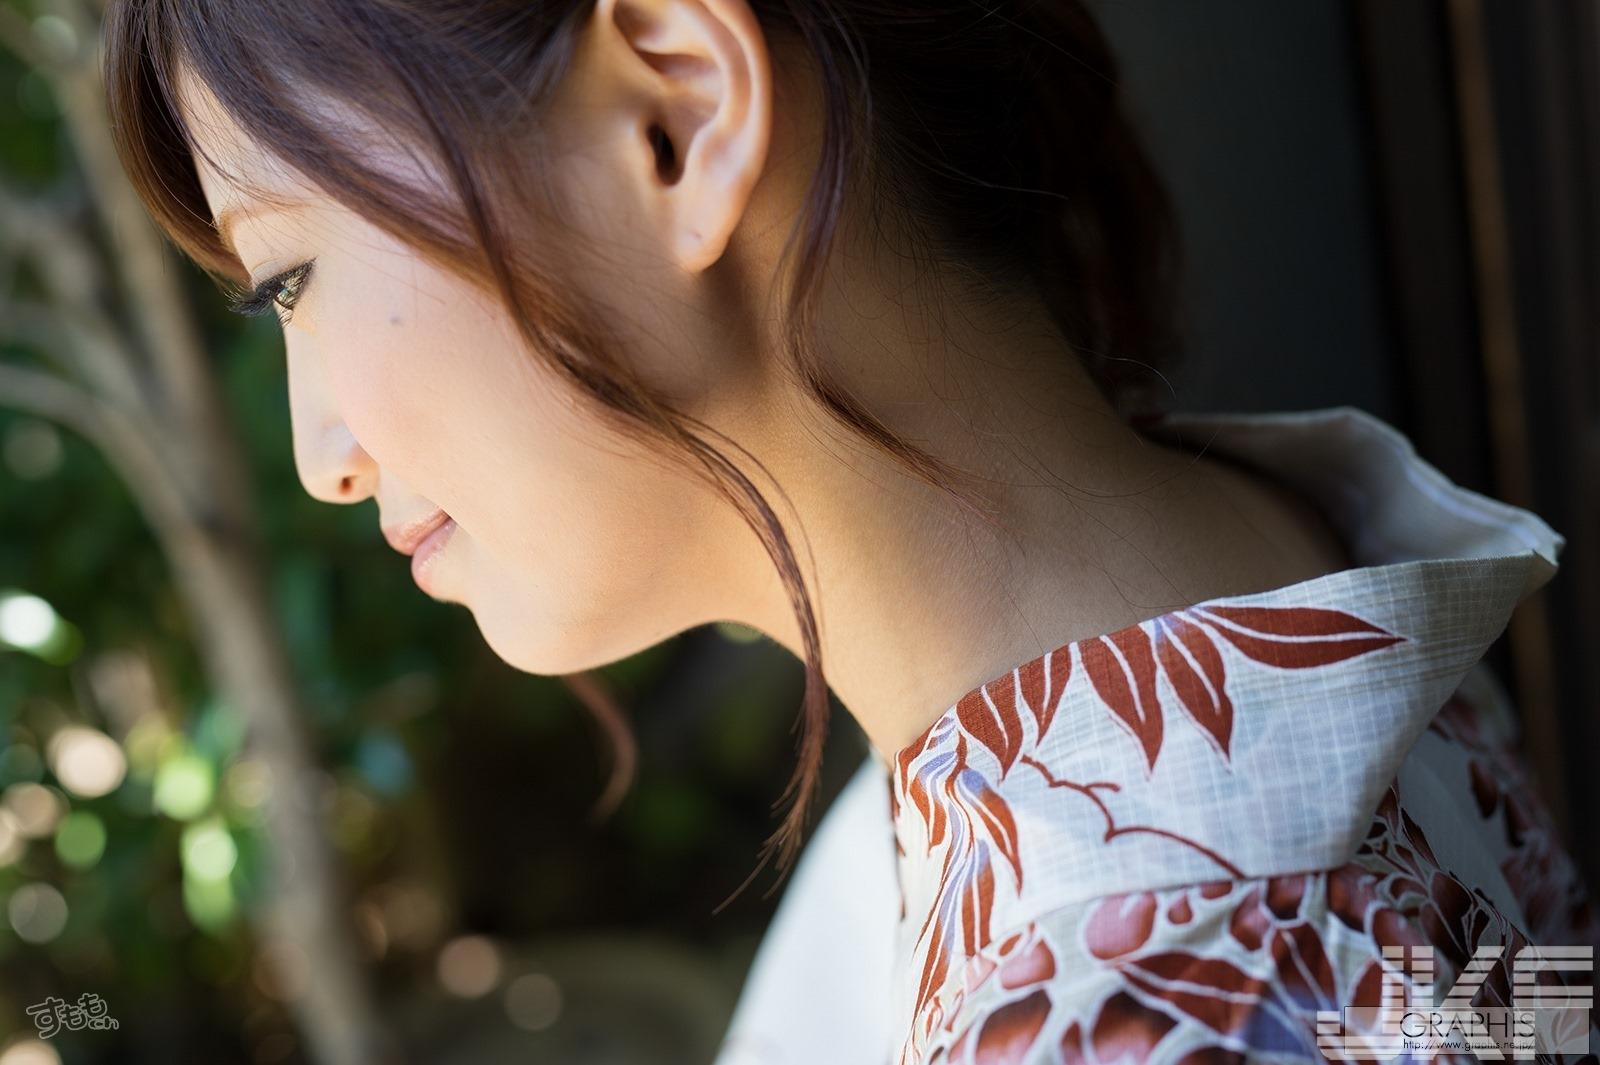 tachibana_harumi_5040-002.jpg